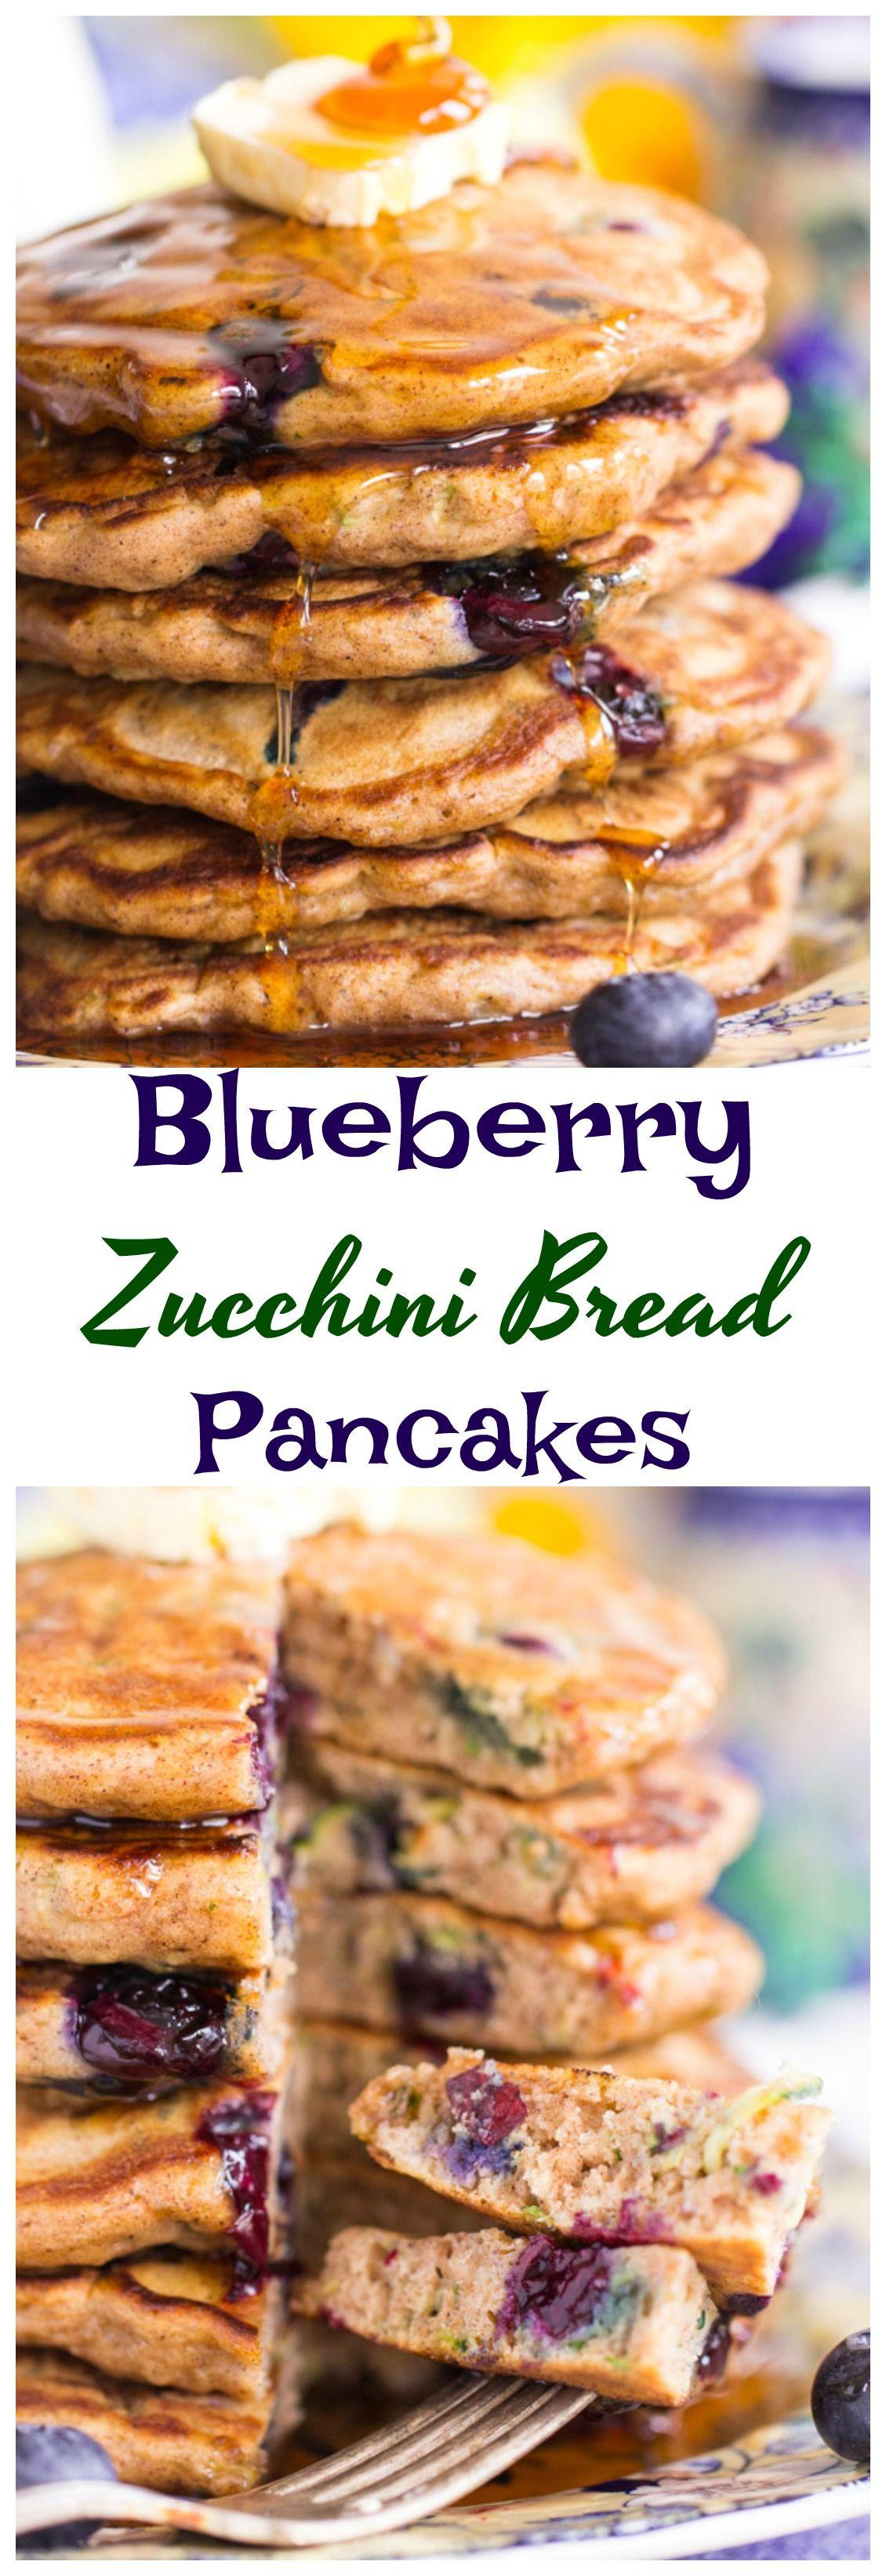 Blueberry Zucchini Bread Pancakes pin thegoldlininggirl ...